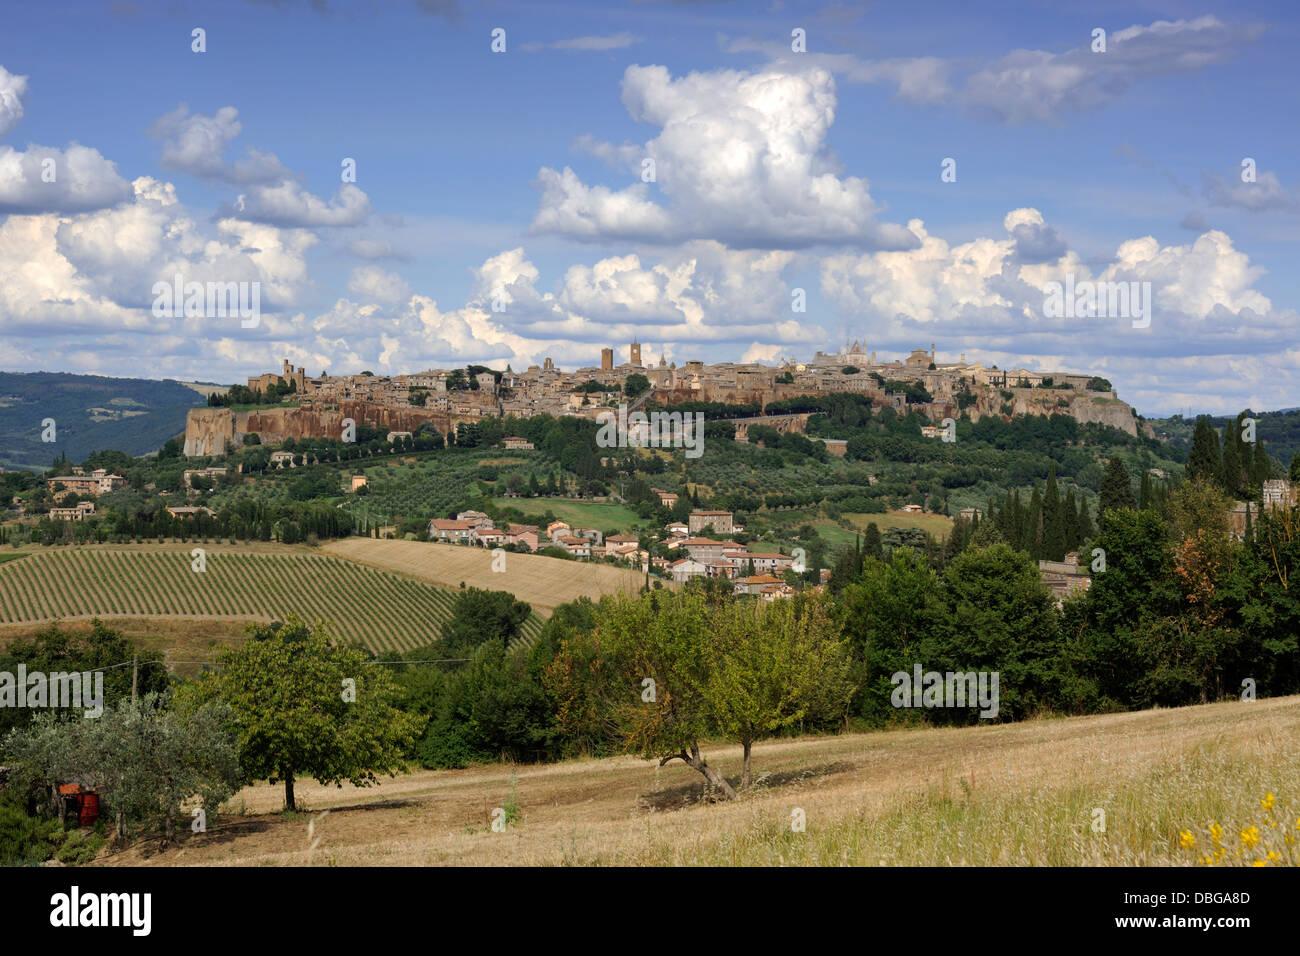 italy, umbria, orvieto - Stock Image